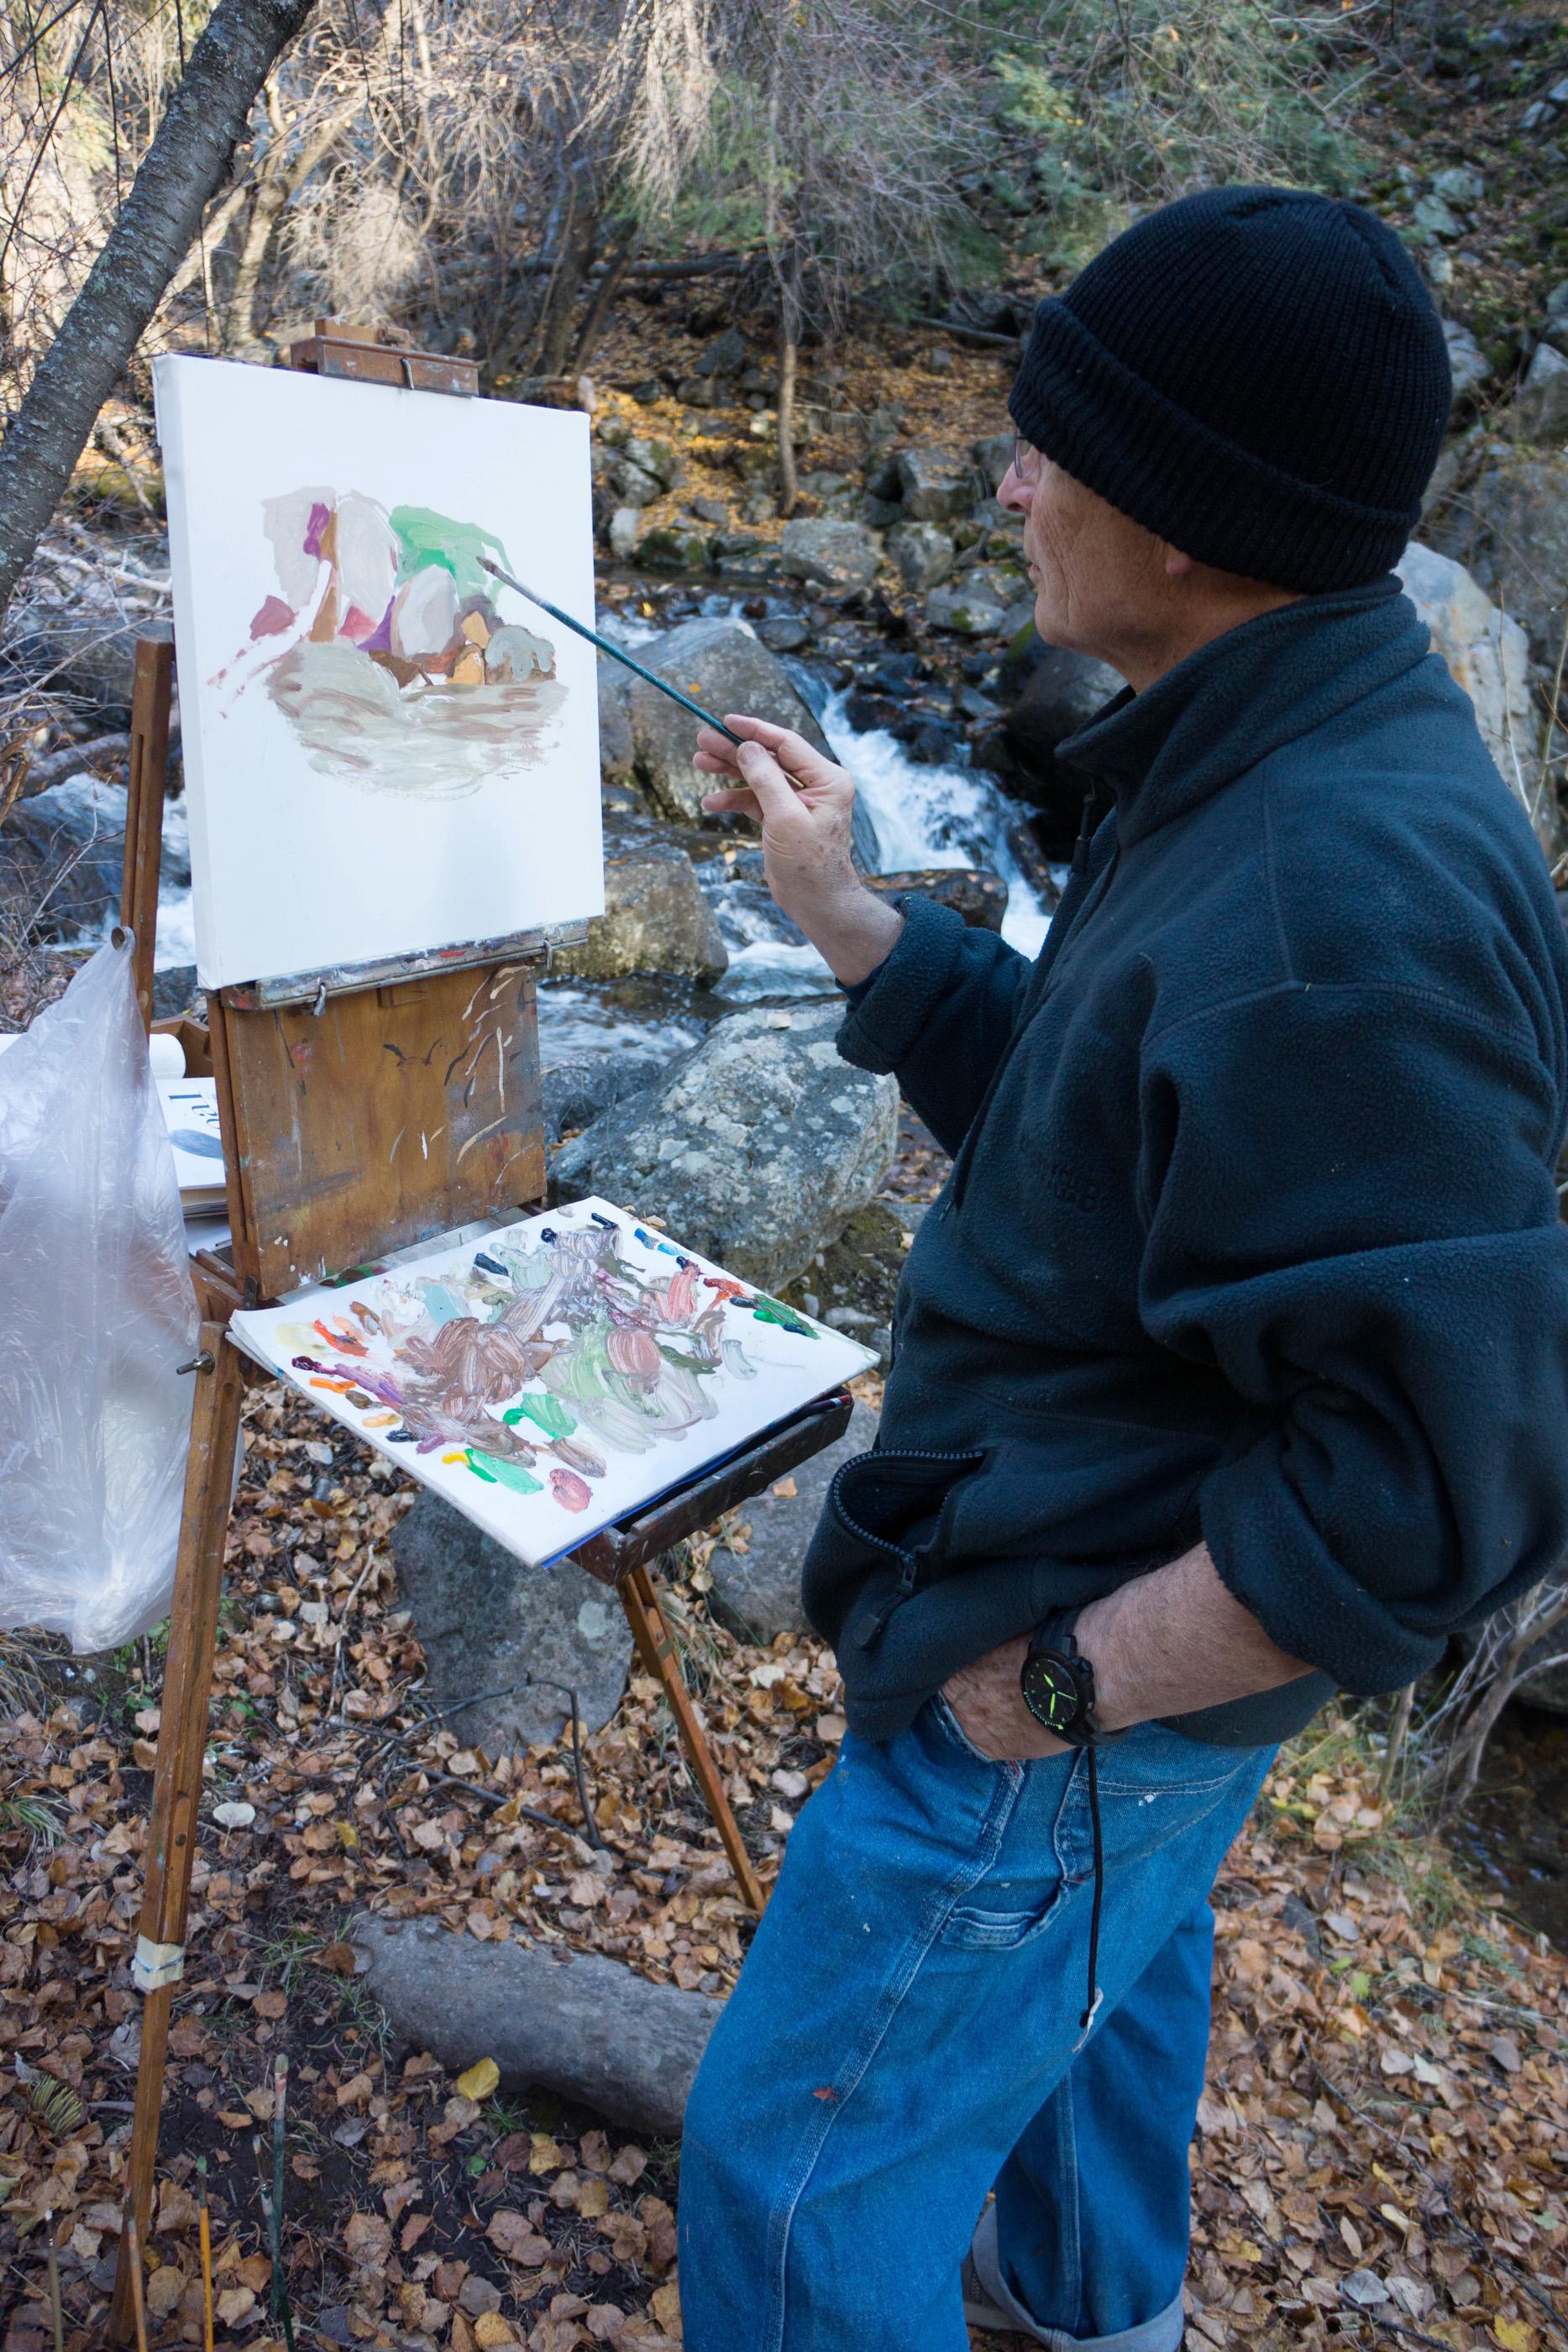 site-LR 10.27.13 LR-RAW-PT paints N. Crestone Creek 16x16.jpg